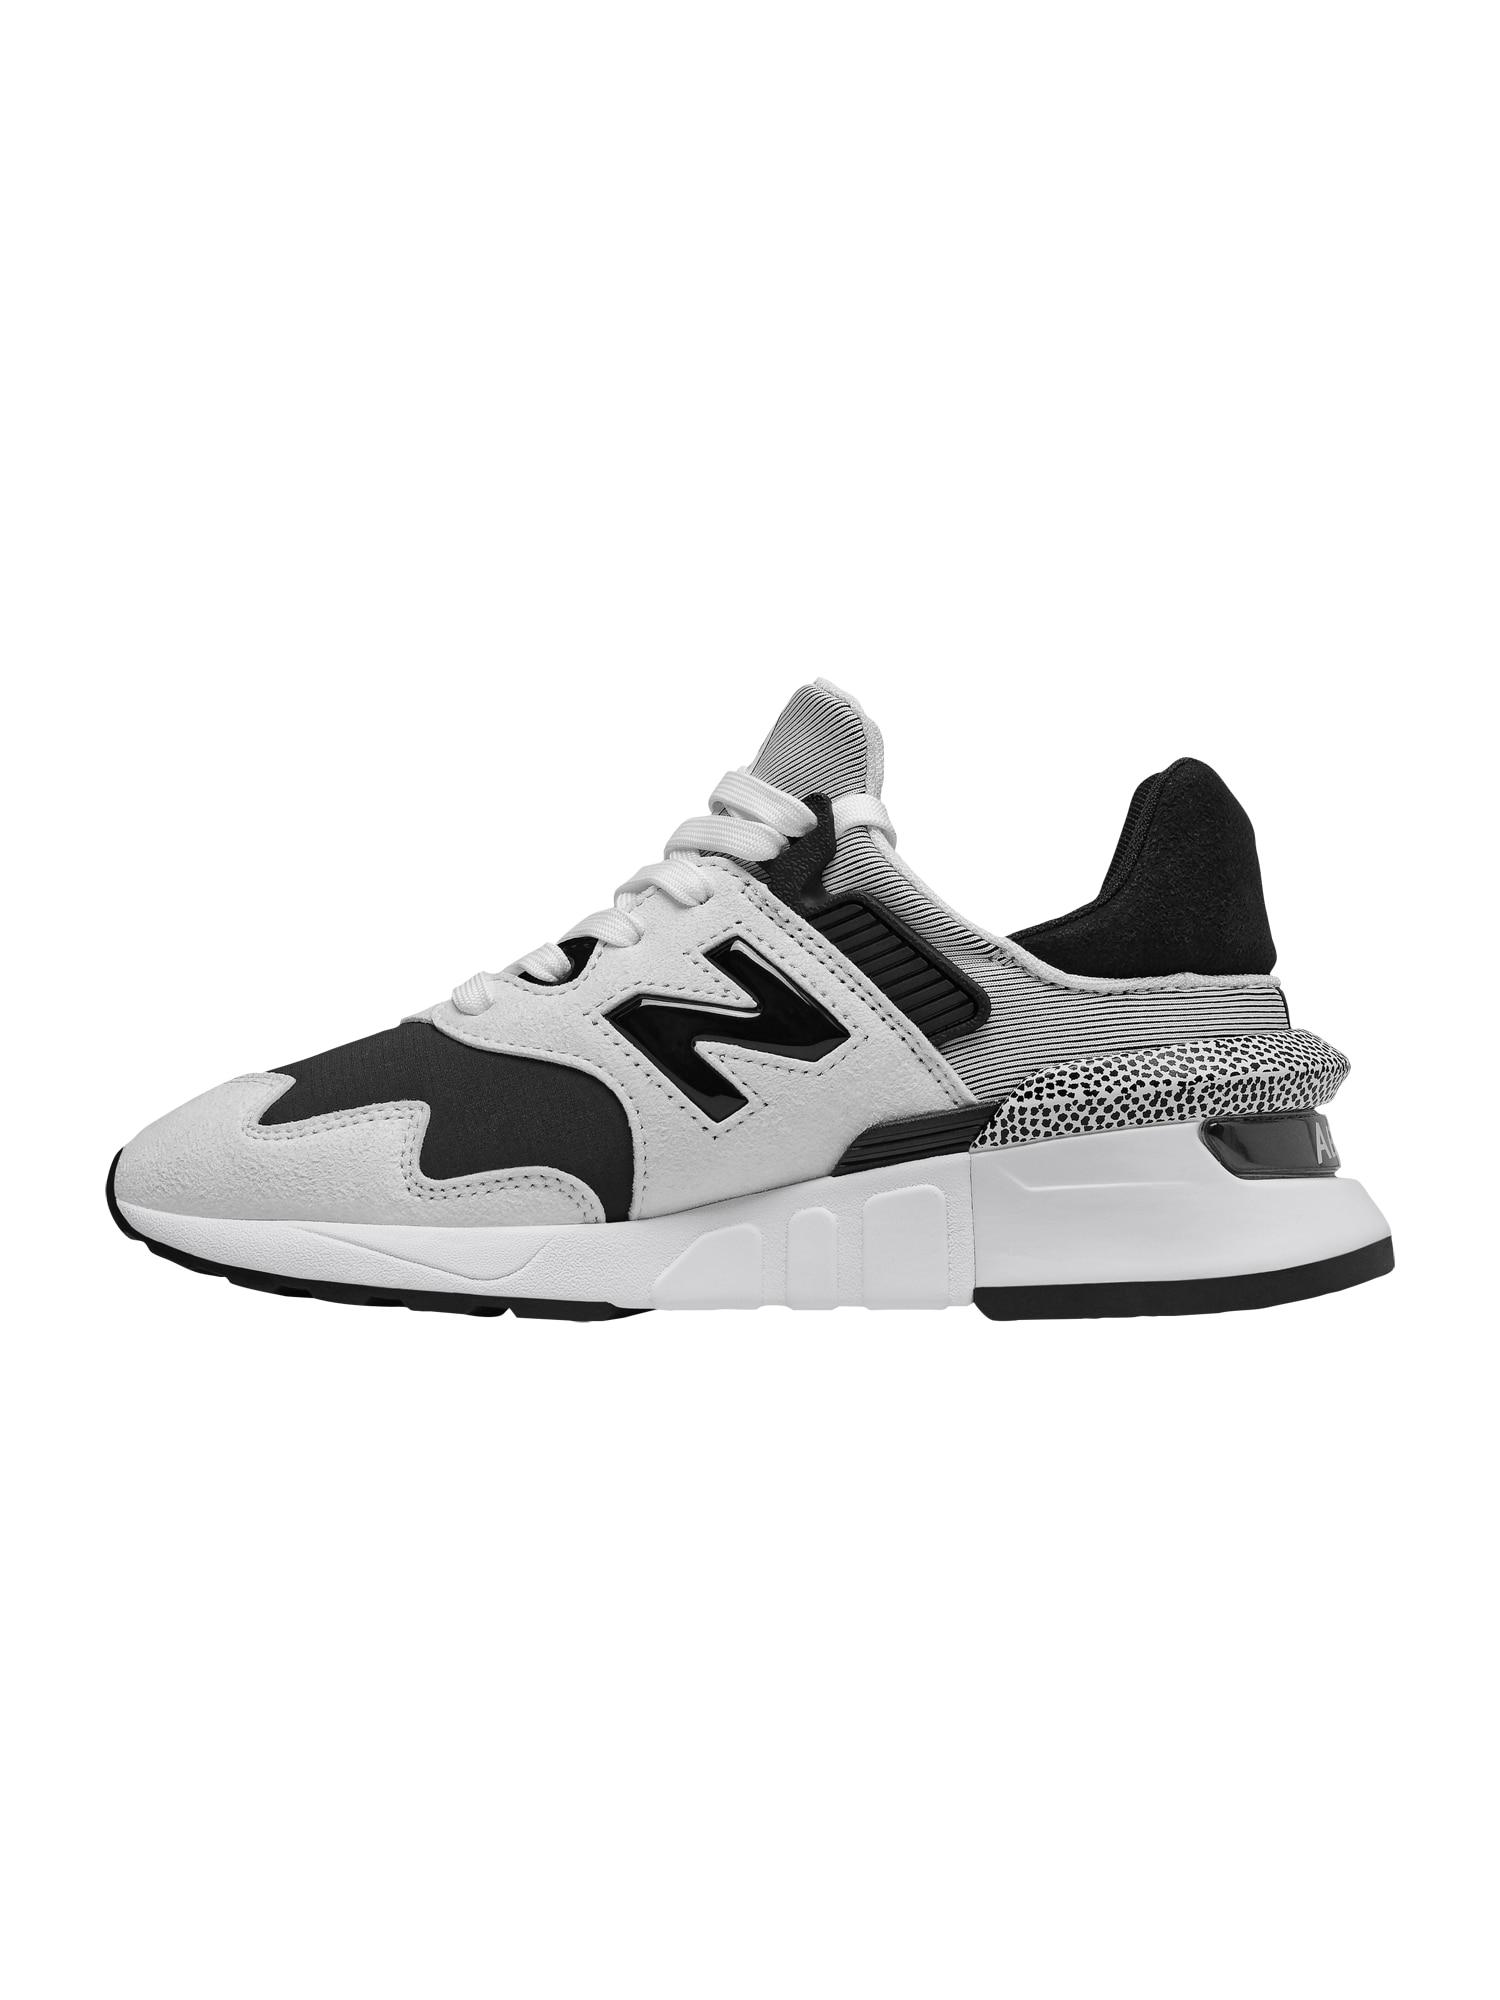 Tenisky WS997 šedá černá New Balance